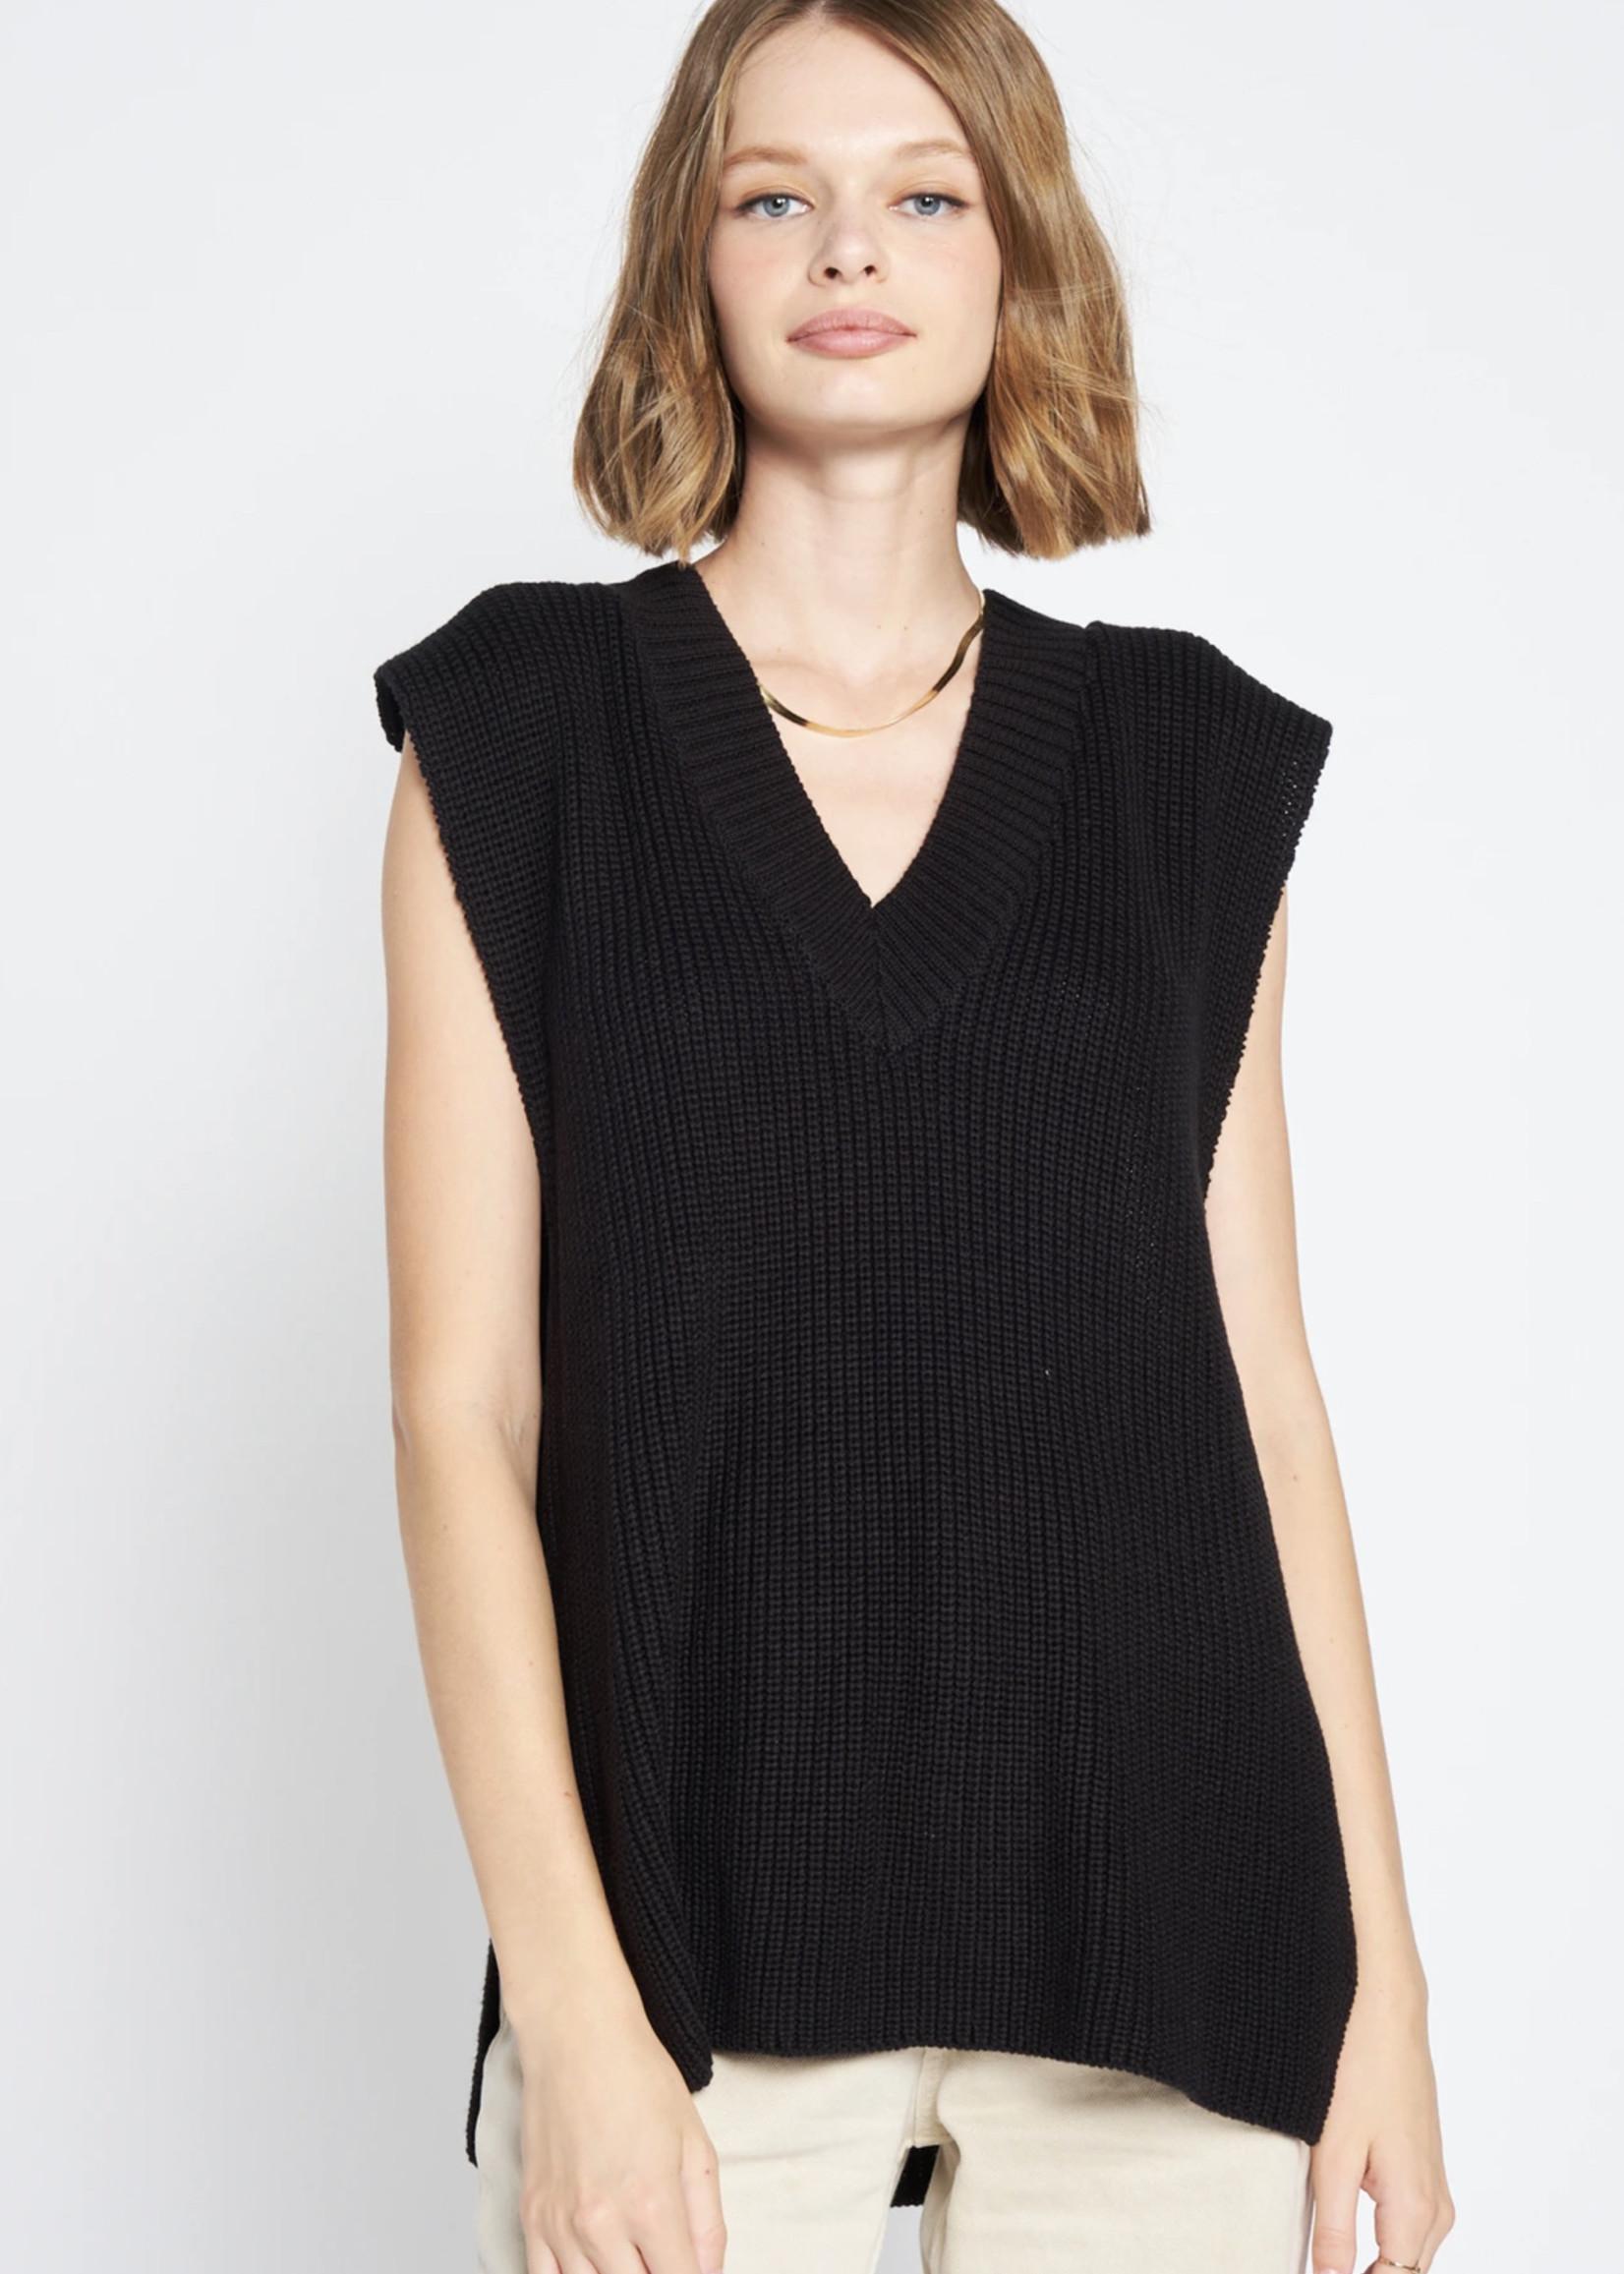 Elitaire Boutique Black V Neck Pullover